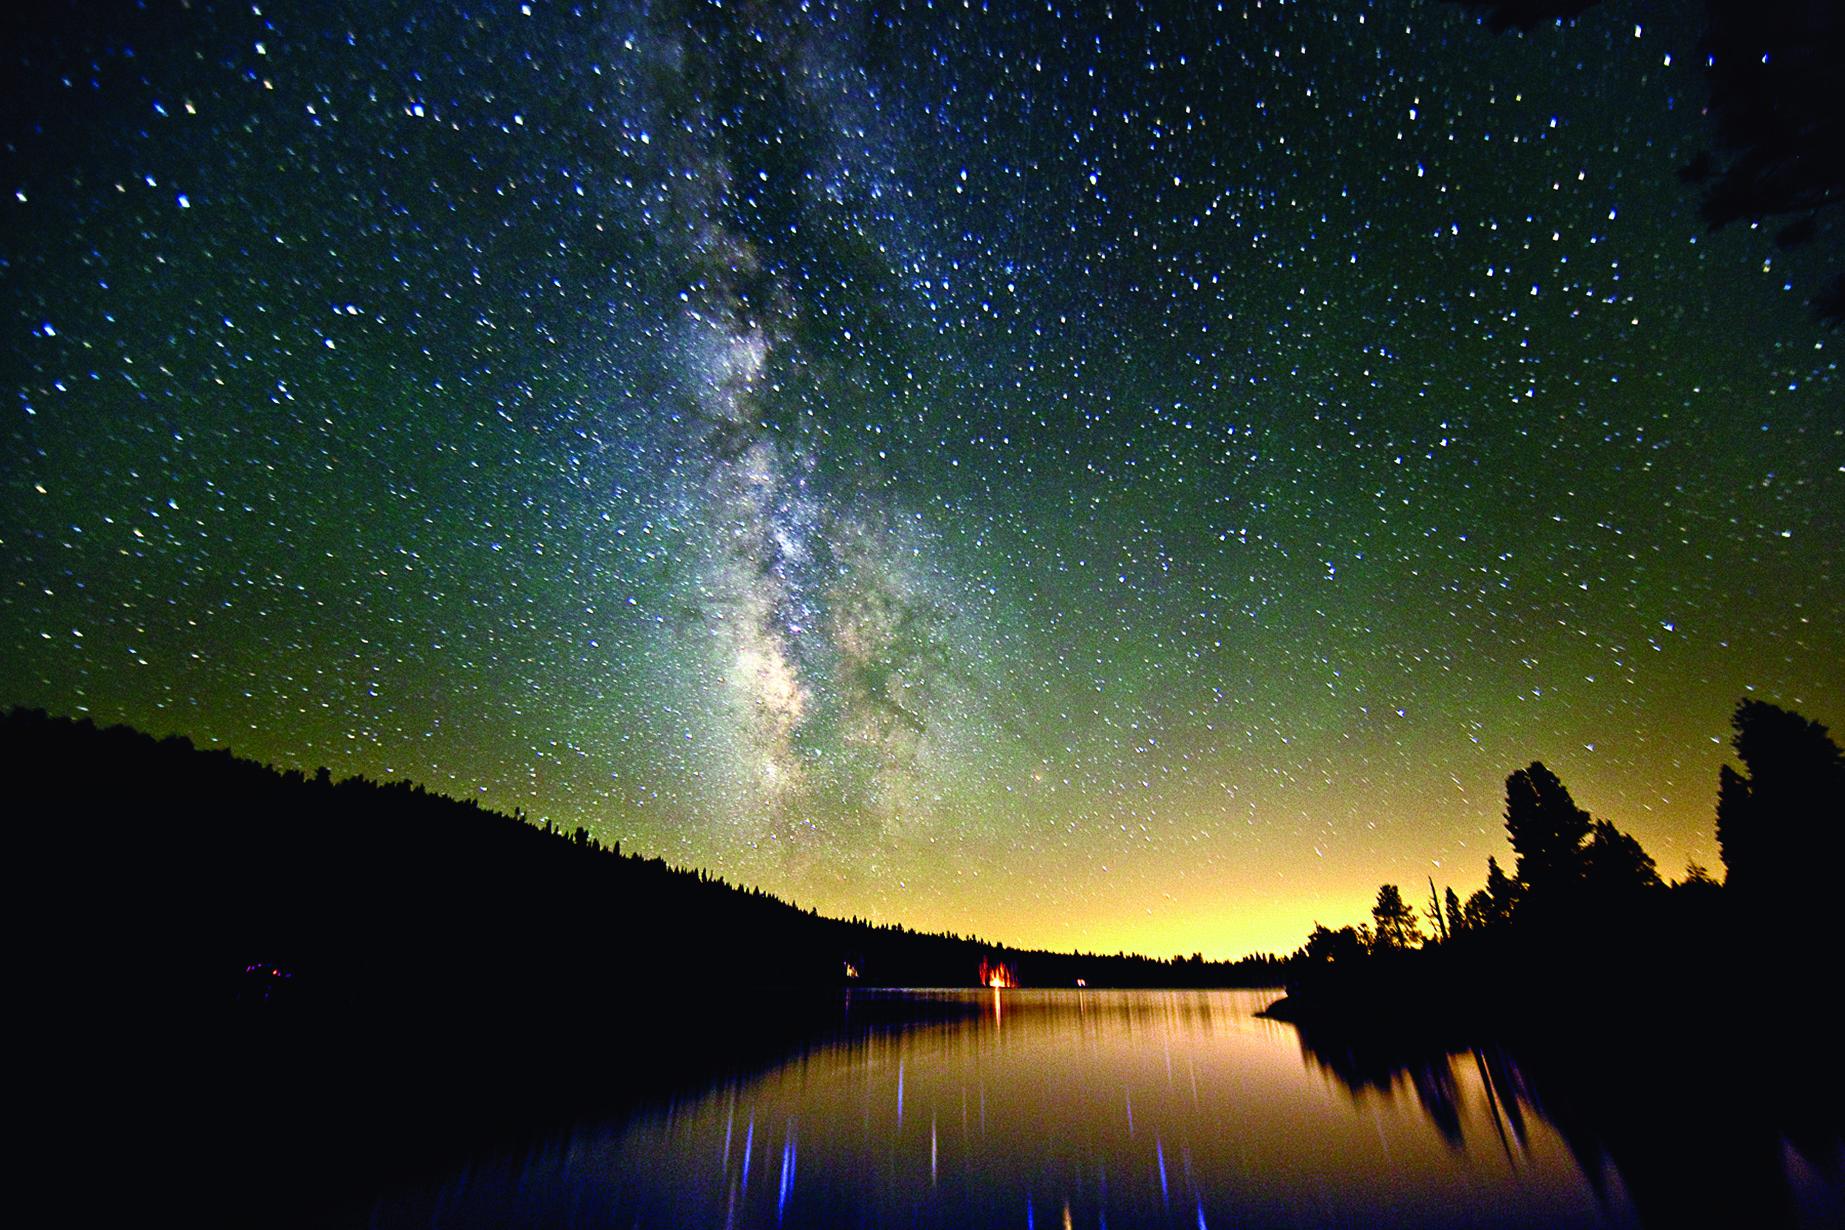 Pinecrest Lake lies in California's Sierra Nevada